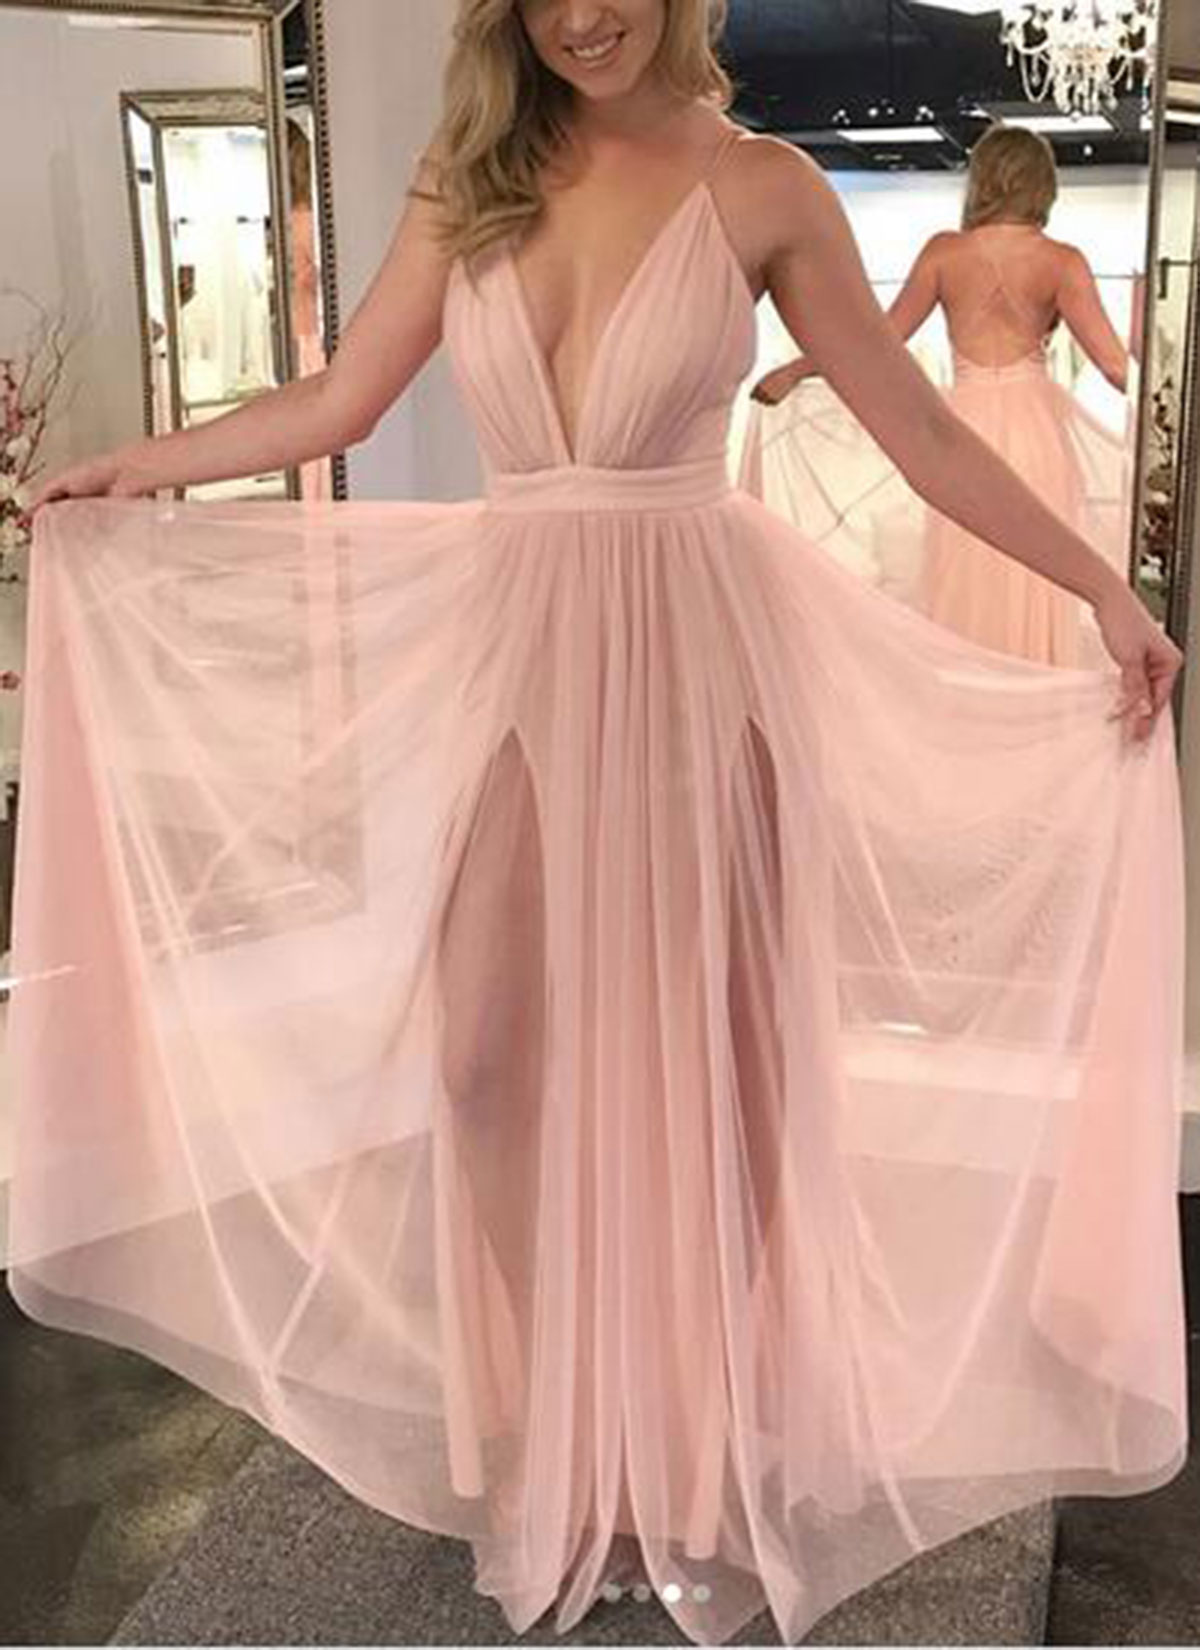 1fa8238b97 Deep V Neck Criss Cross Blush Pink Prom Dresses on Storenvy